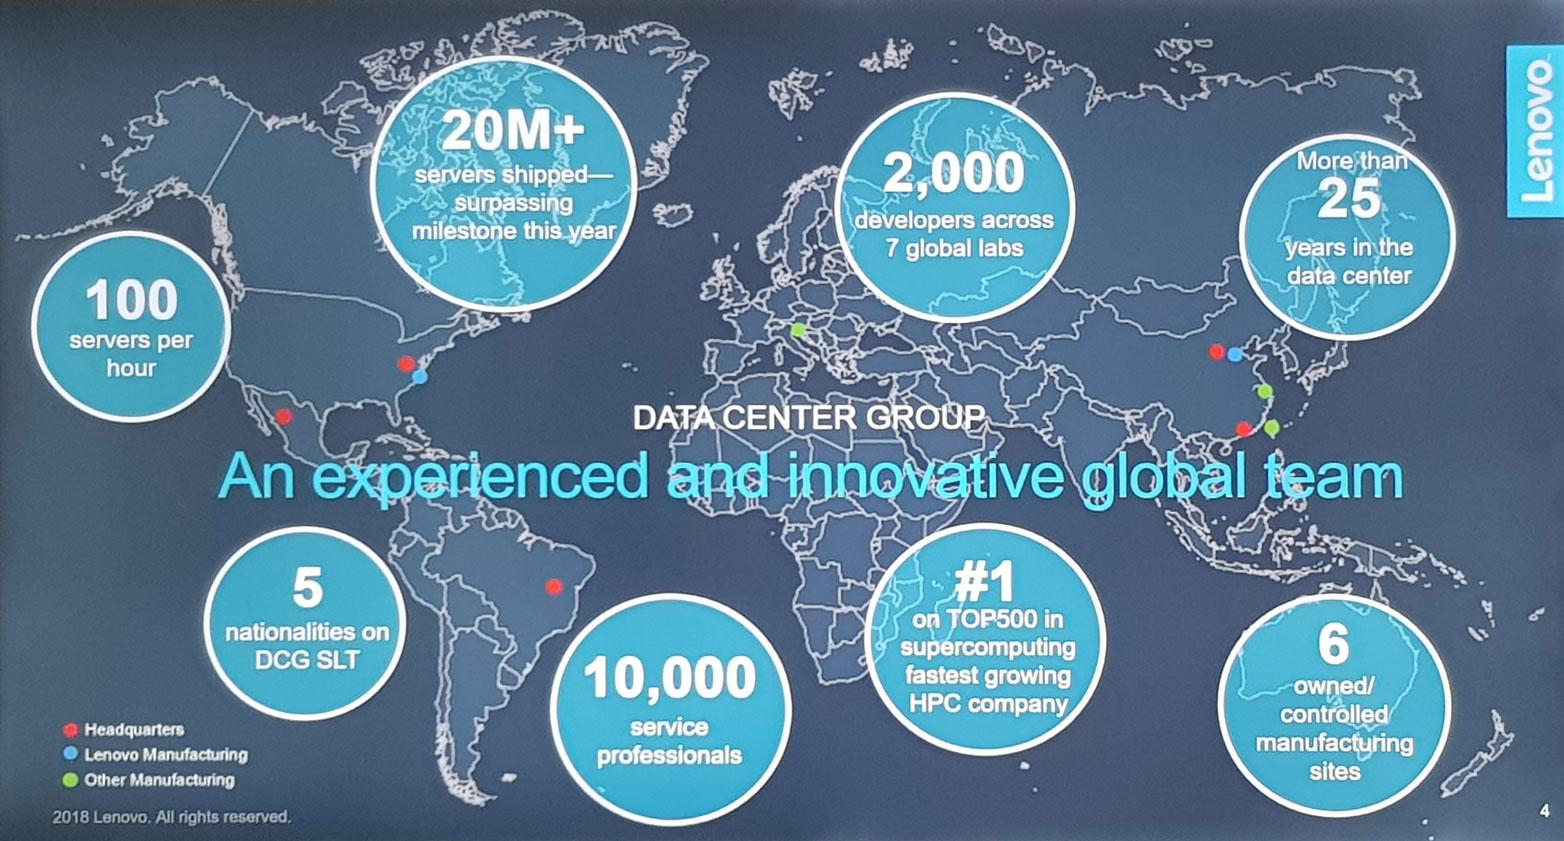 Lenovo - An experienced and innovative global team